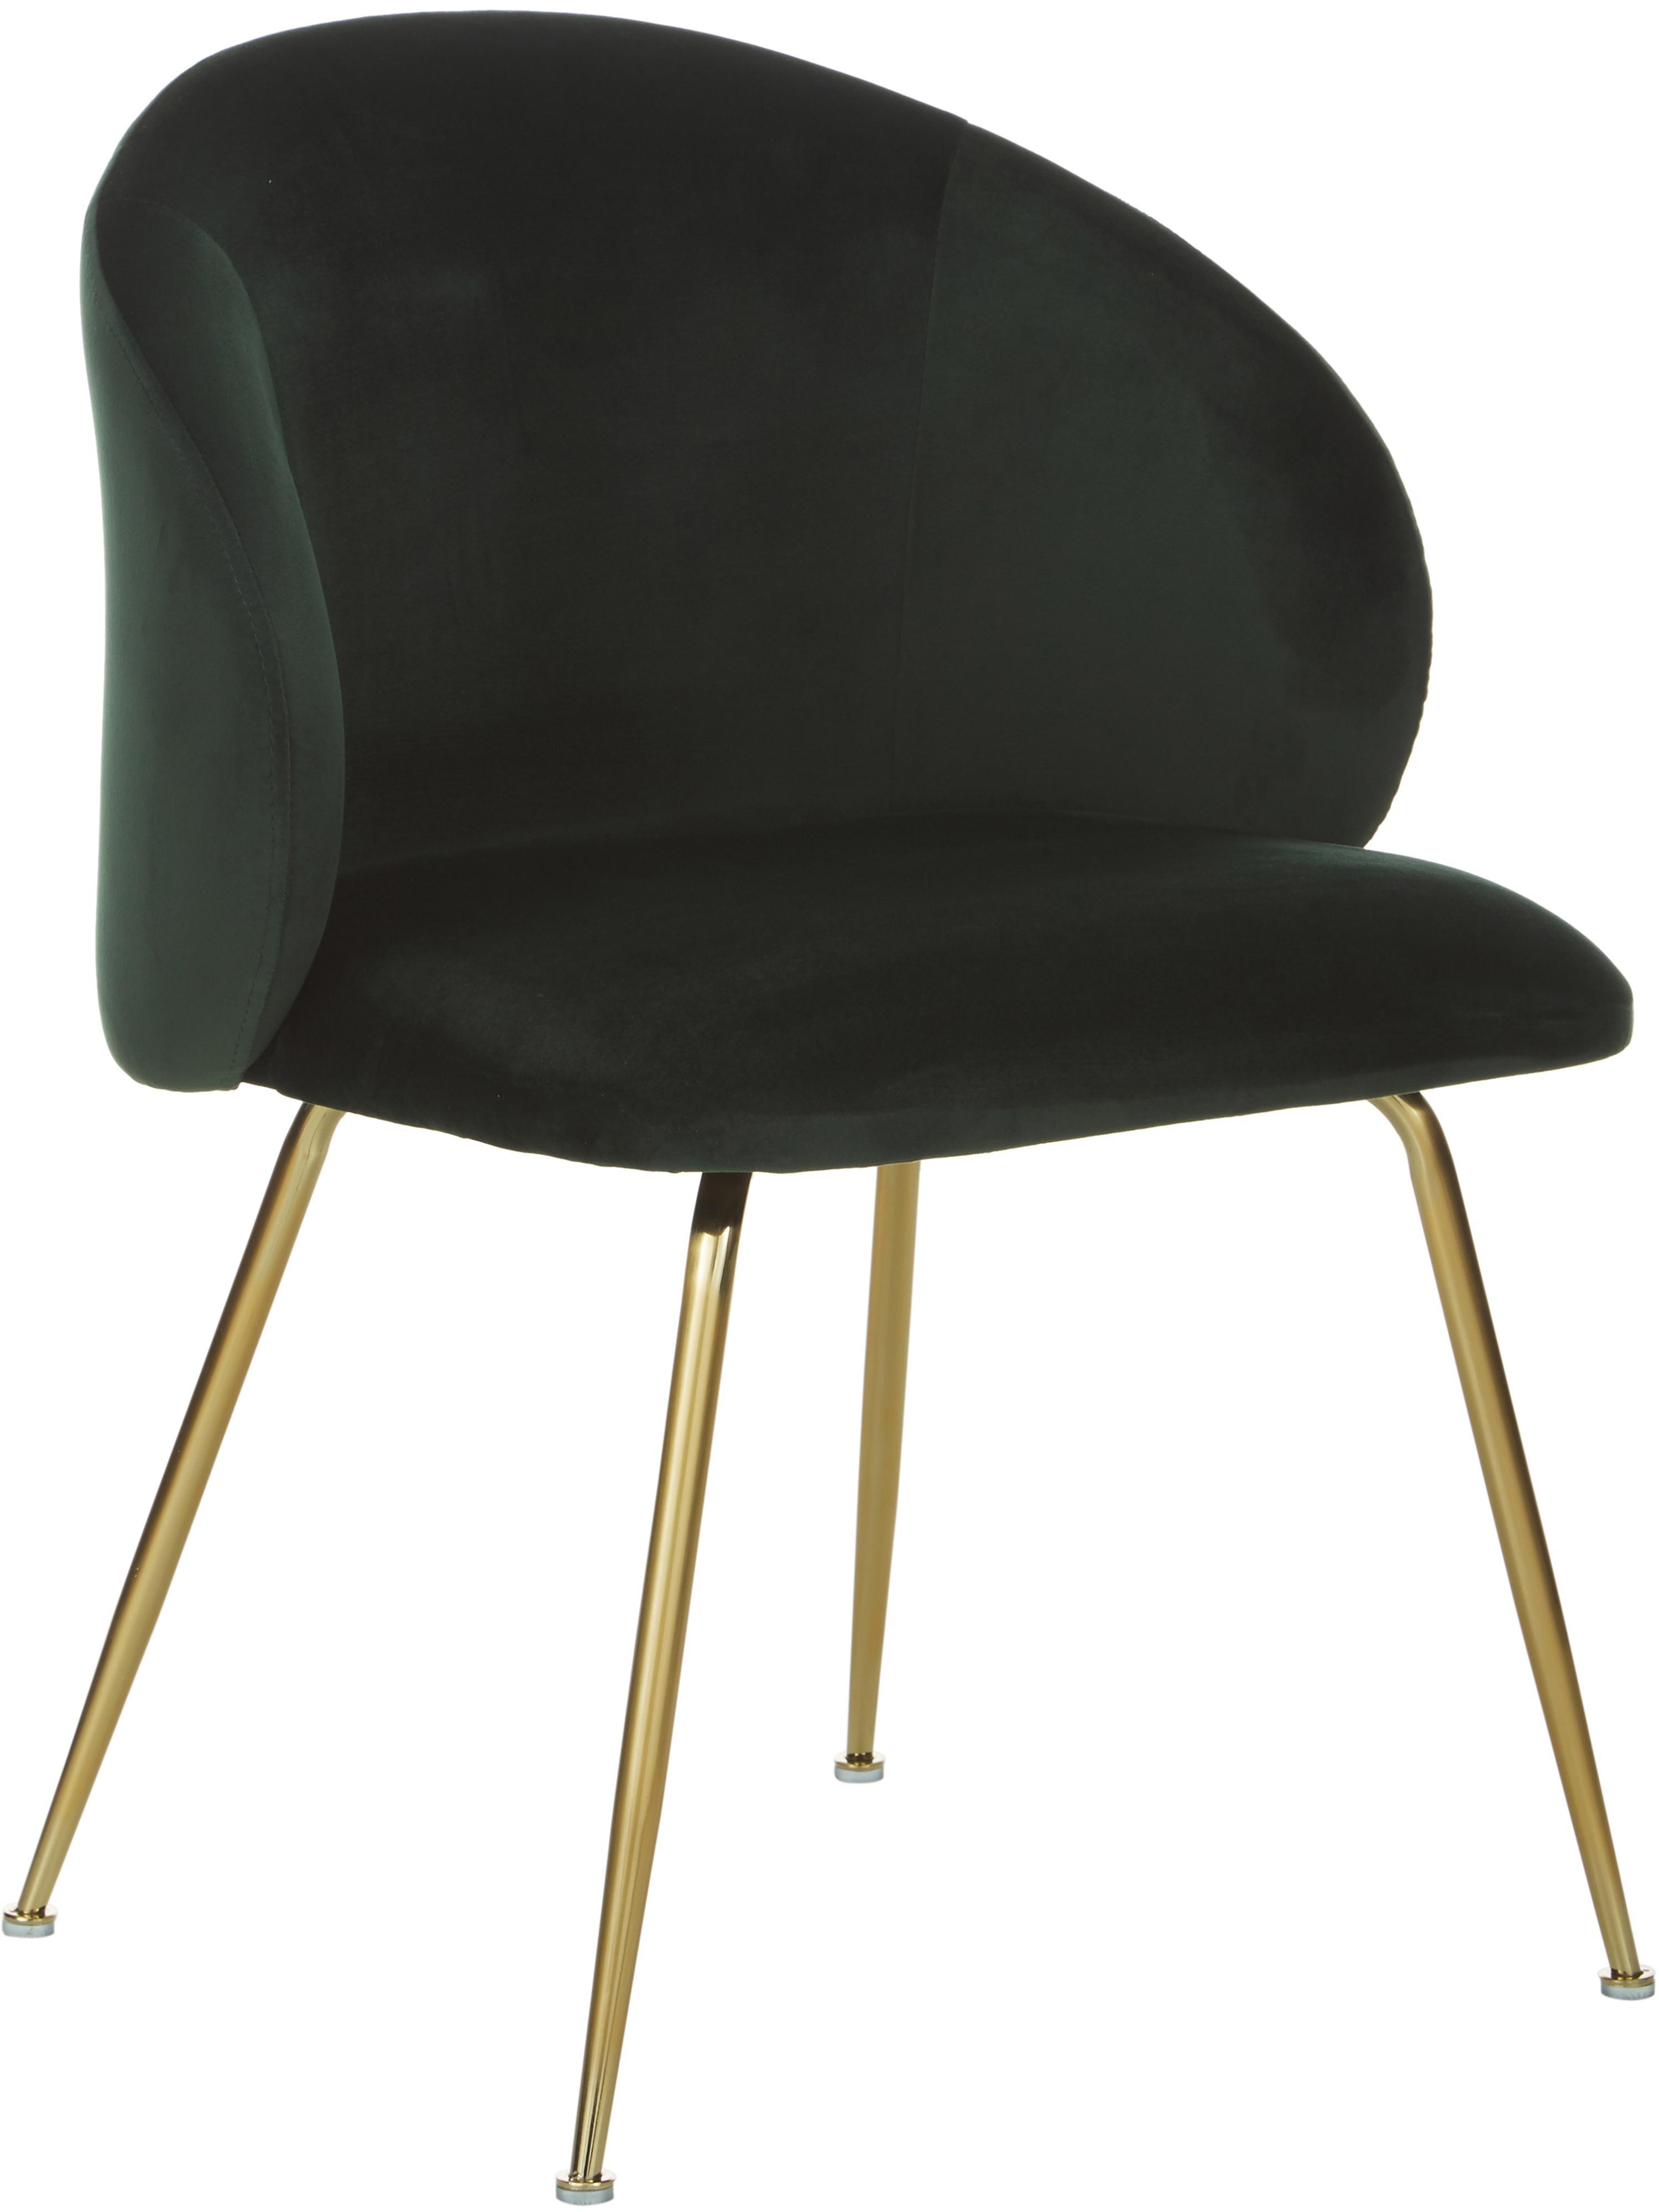 Samt-Polsterstühle Luisa, 2 Stück, Beine: Metall, lackiert, Samt Dunkelgrün, Gold, B 61 x T 58 cm